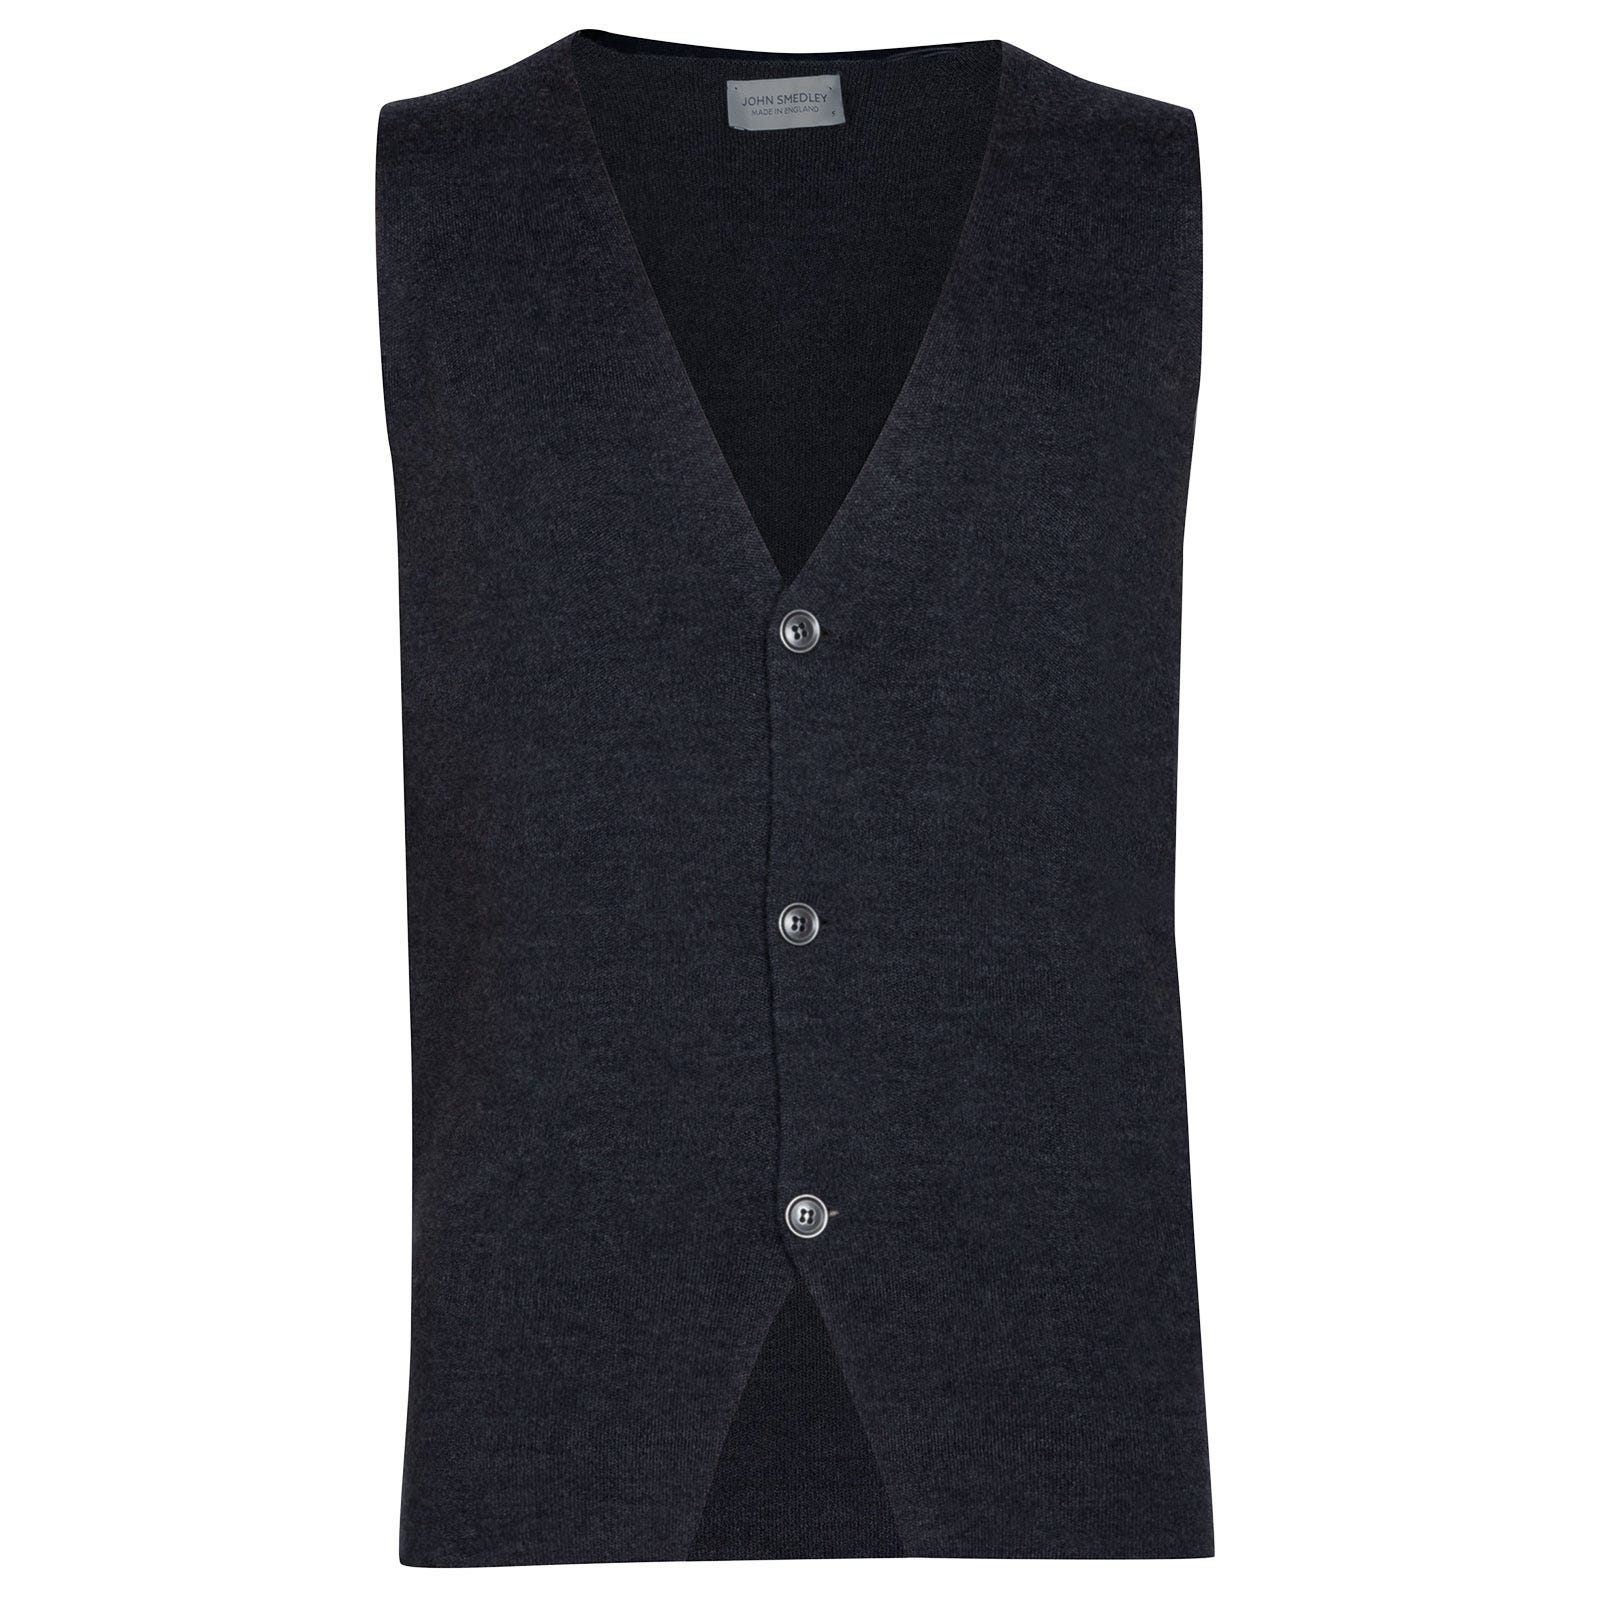 John Smedley Telford Merino Wool Waistcoat in Charcoal-XXL